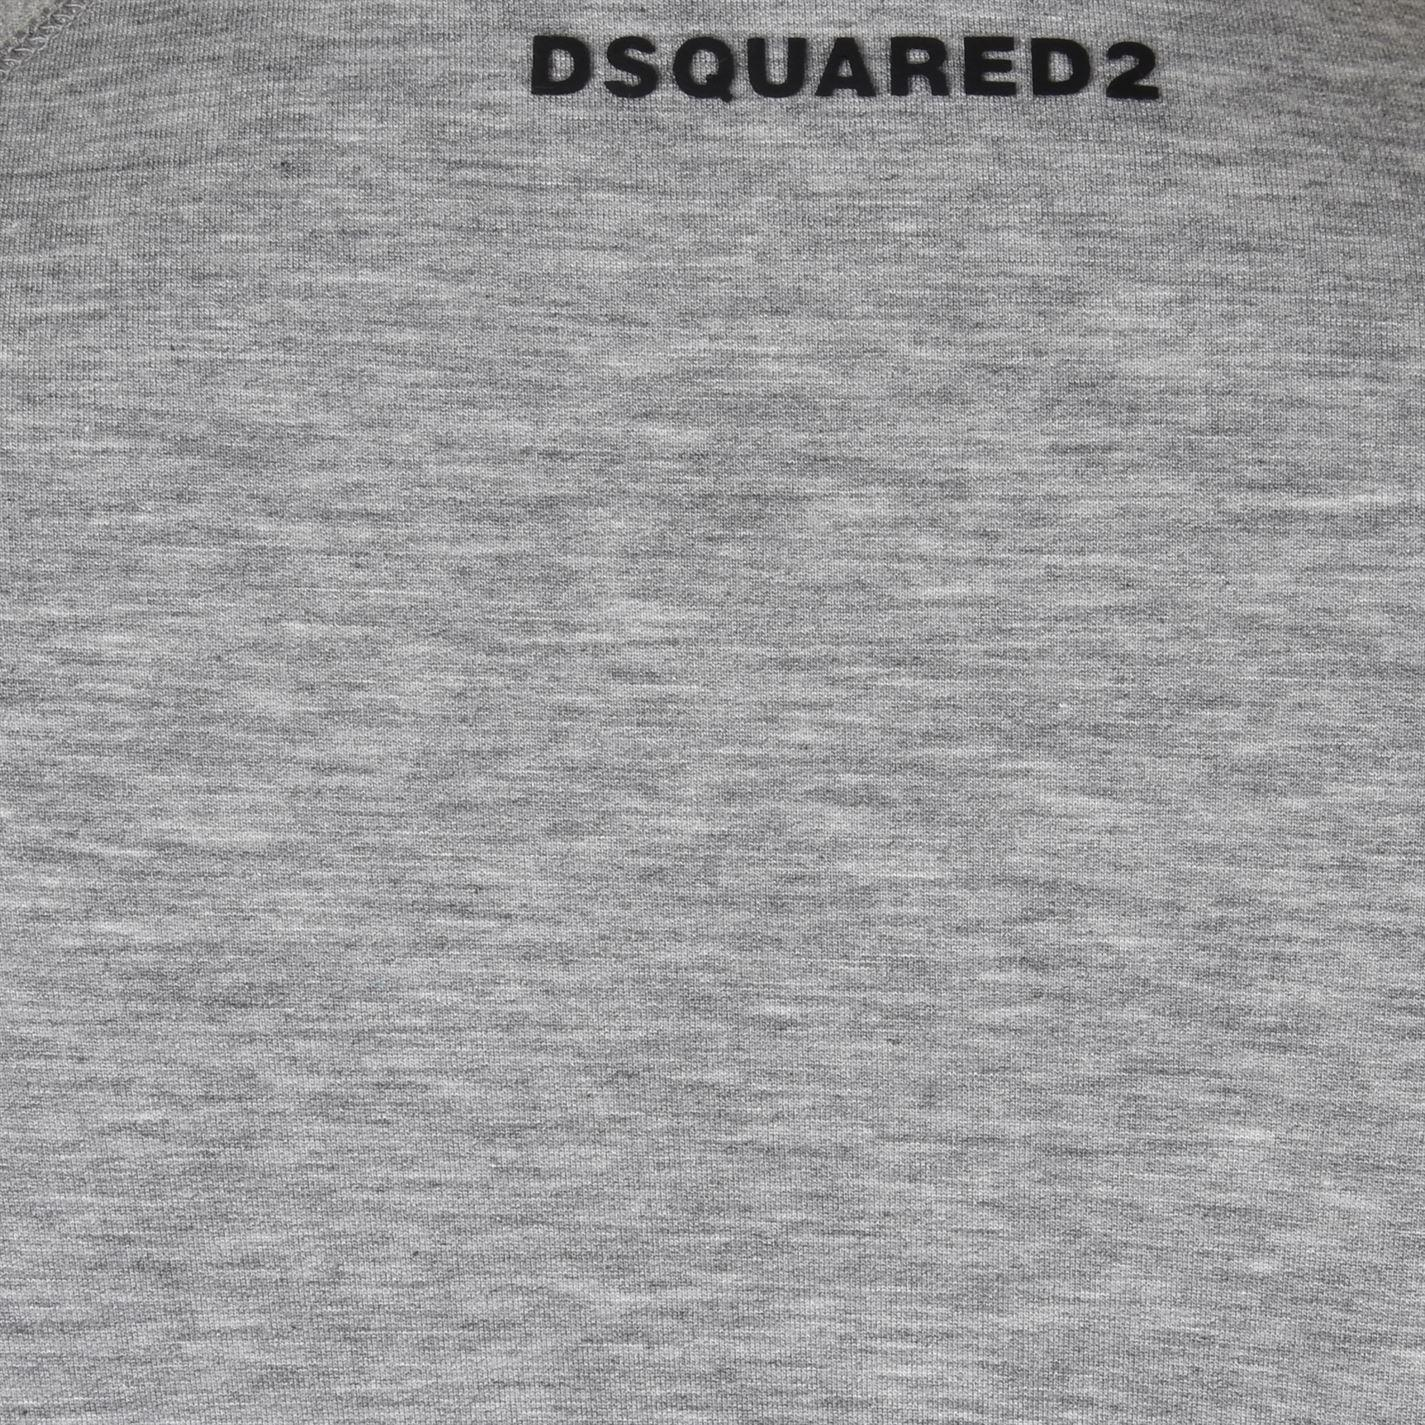 DSquared² Rubber Logo Crew Sweatshirt in Grey Marl (Grey) for Men